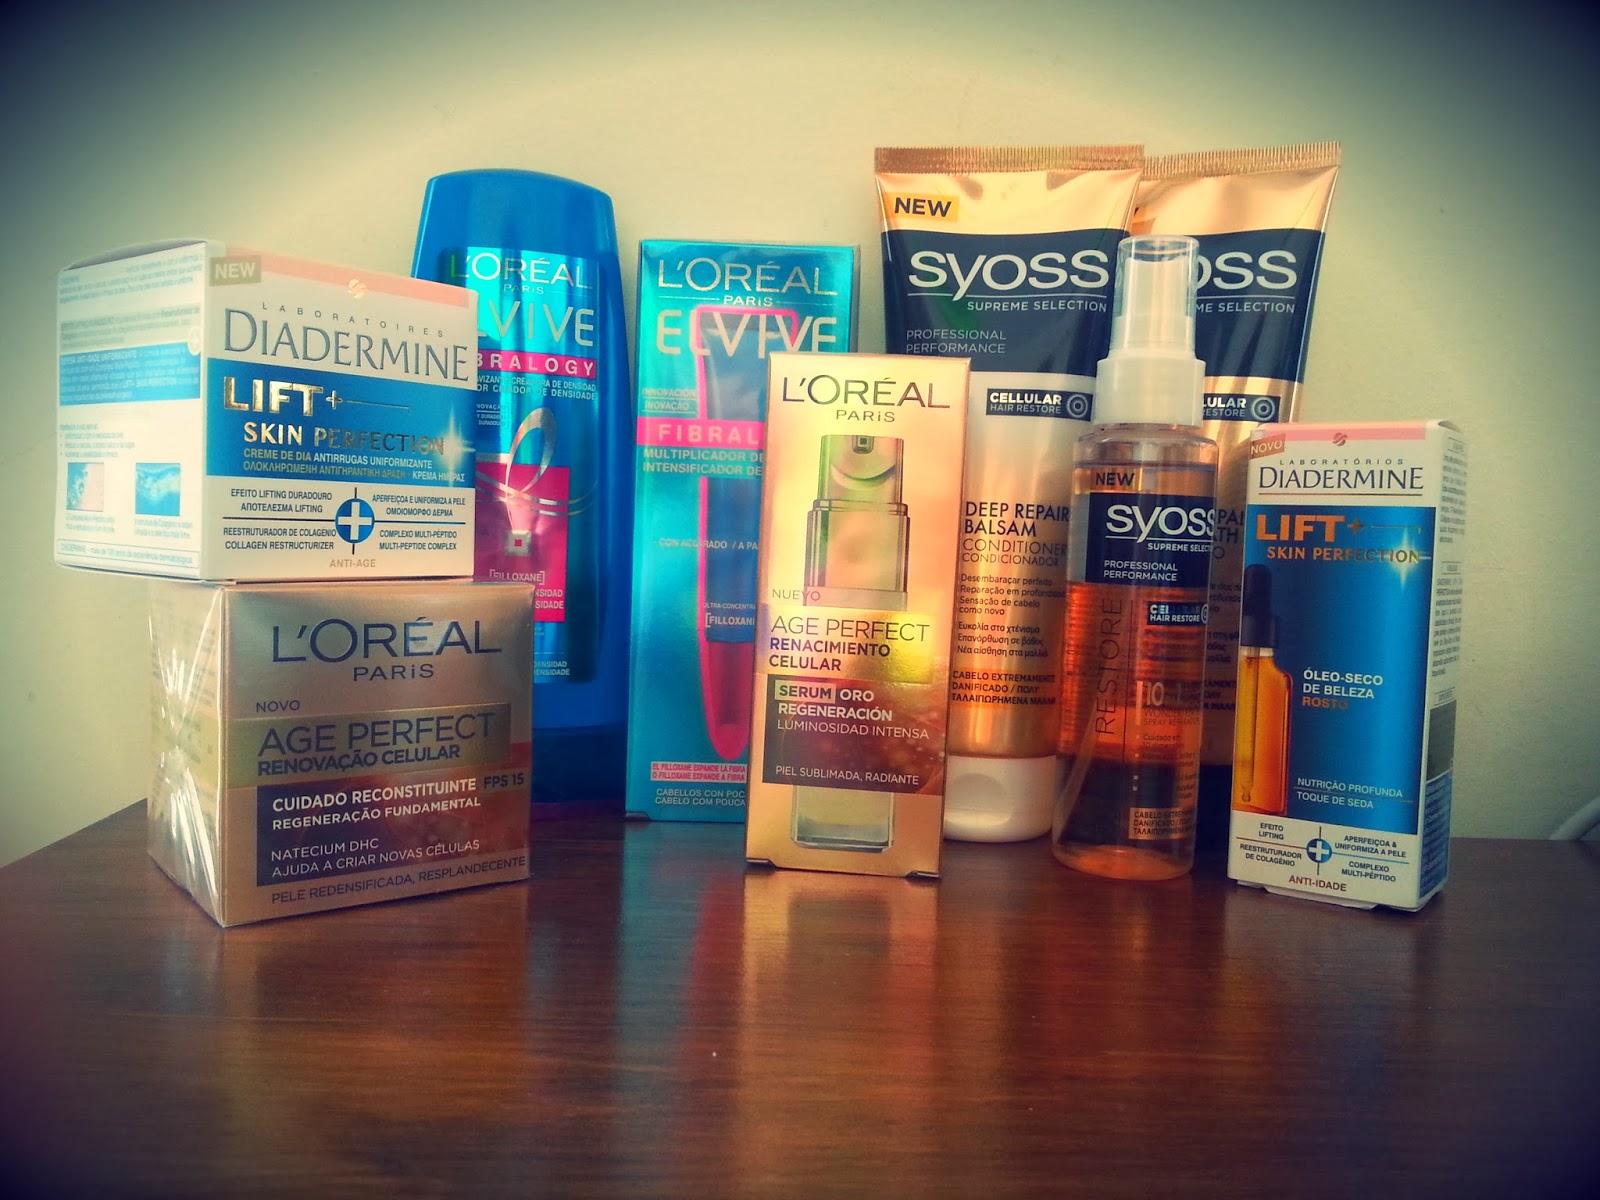 Syoss Supreme Selection L'Oréal Elvive Fibralogy Diadermine Lift+ Skin Perfection  L'Oréal Age Perfect Óleo Extraordinário + Renovação Celular